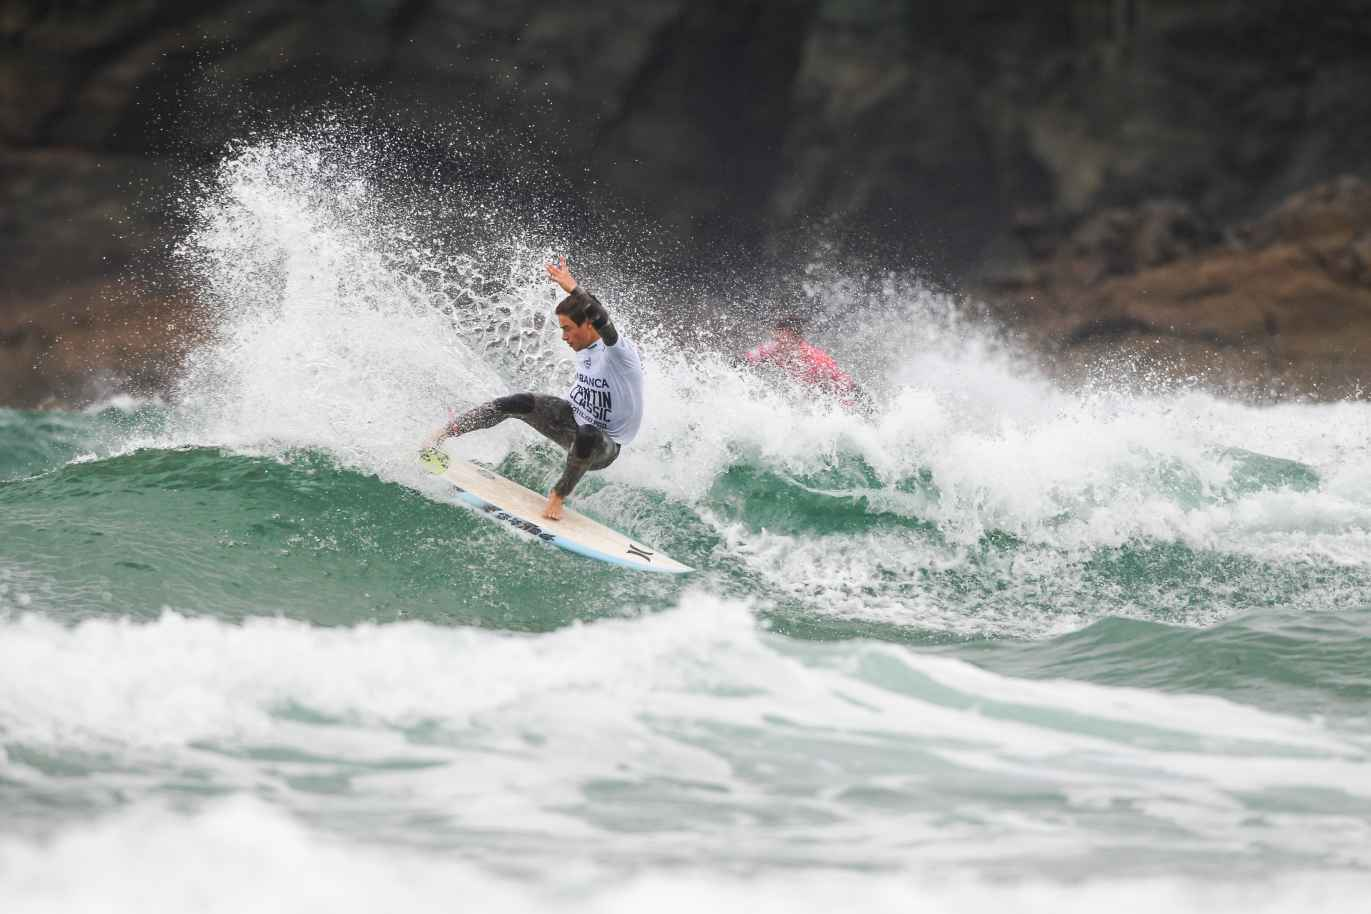 surf30 pantin classic 2021 wsl surf Adur Amatriain 8842PantinClassic2021Masurel